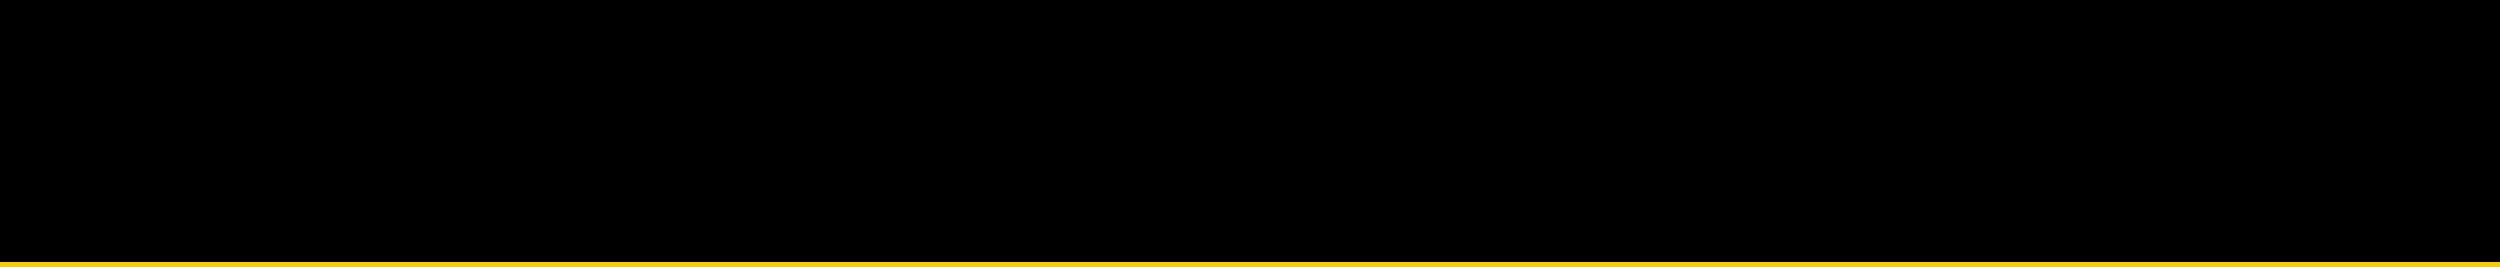 tangier-island-titles6.png